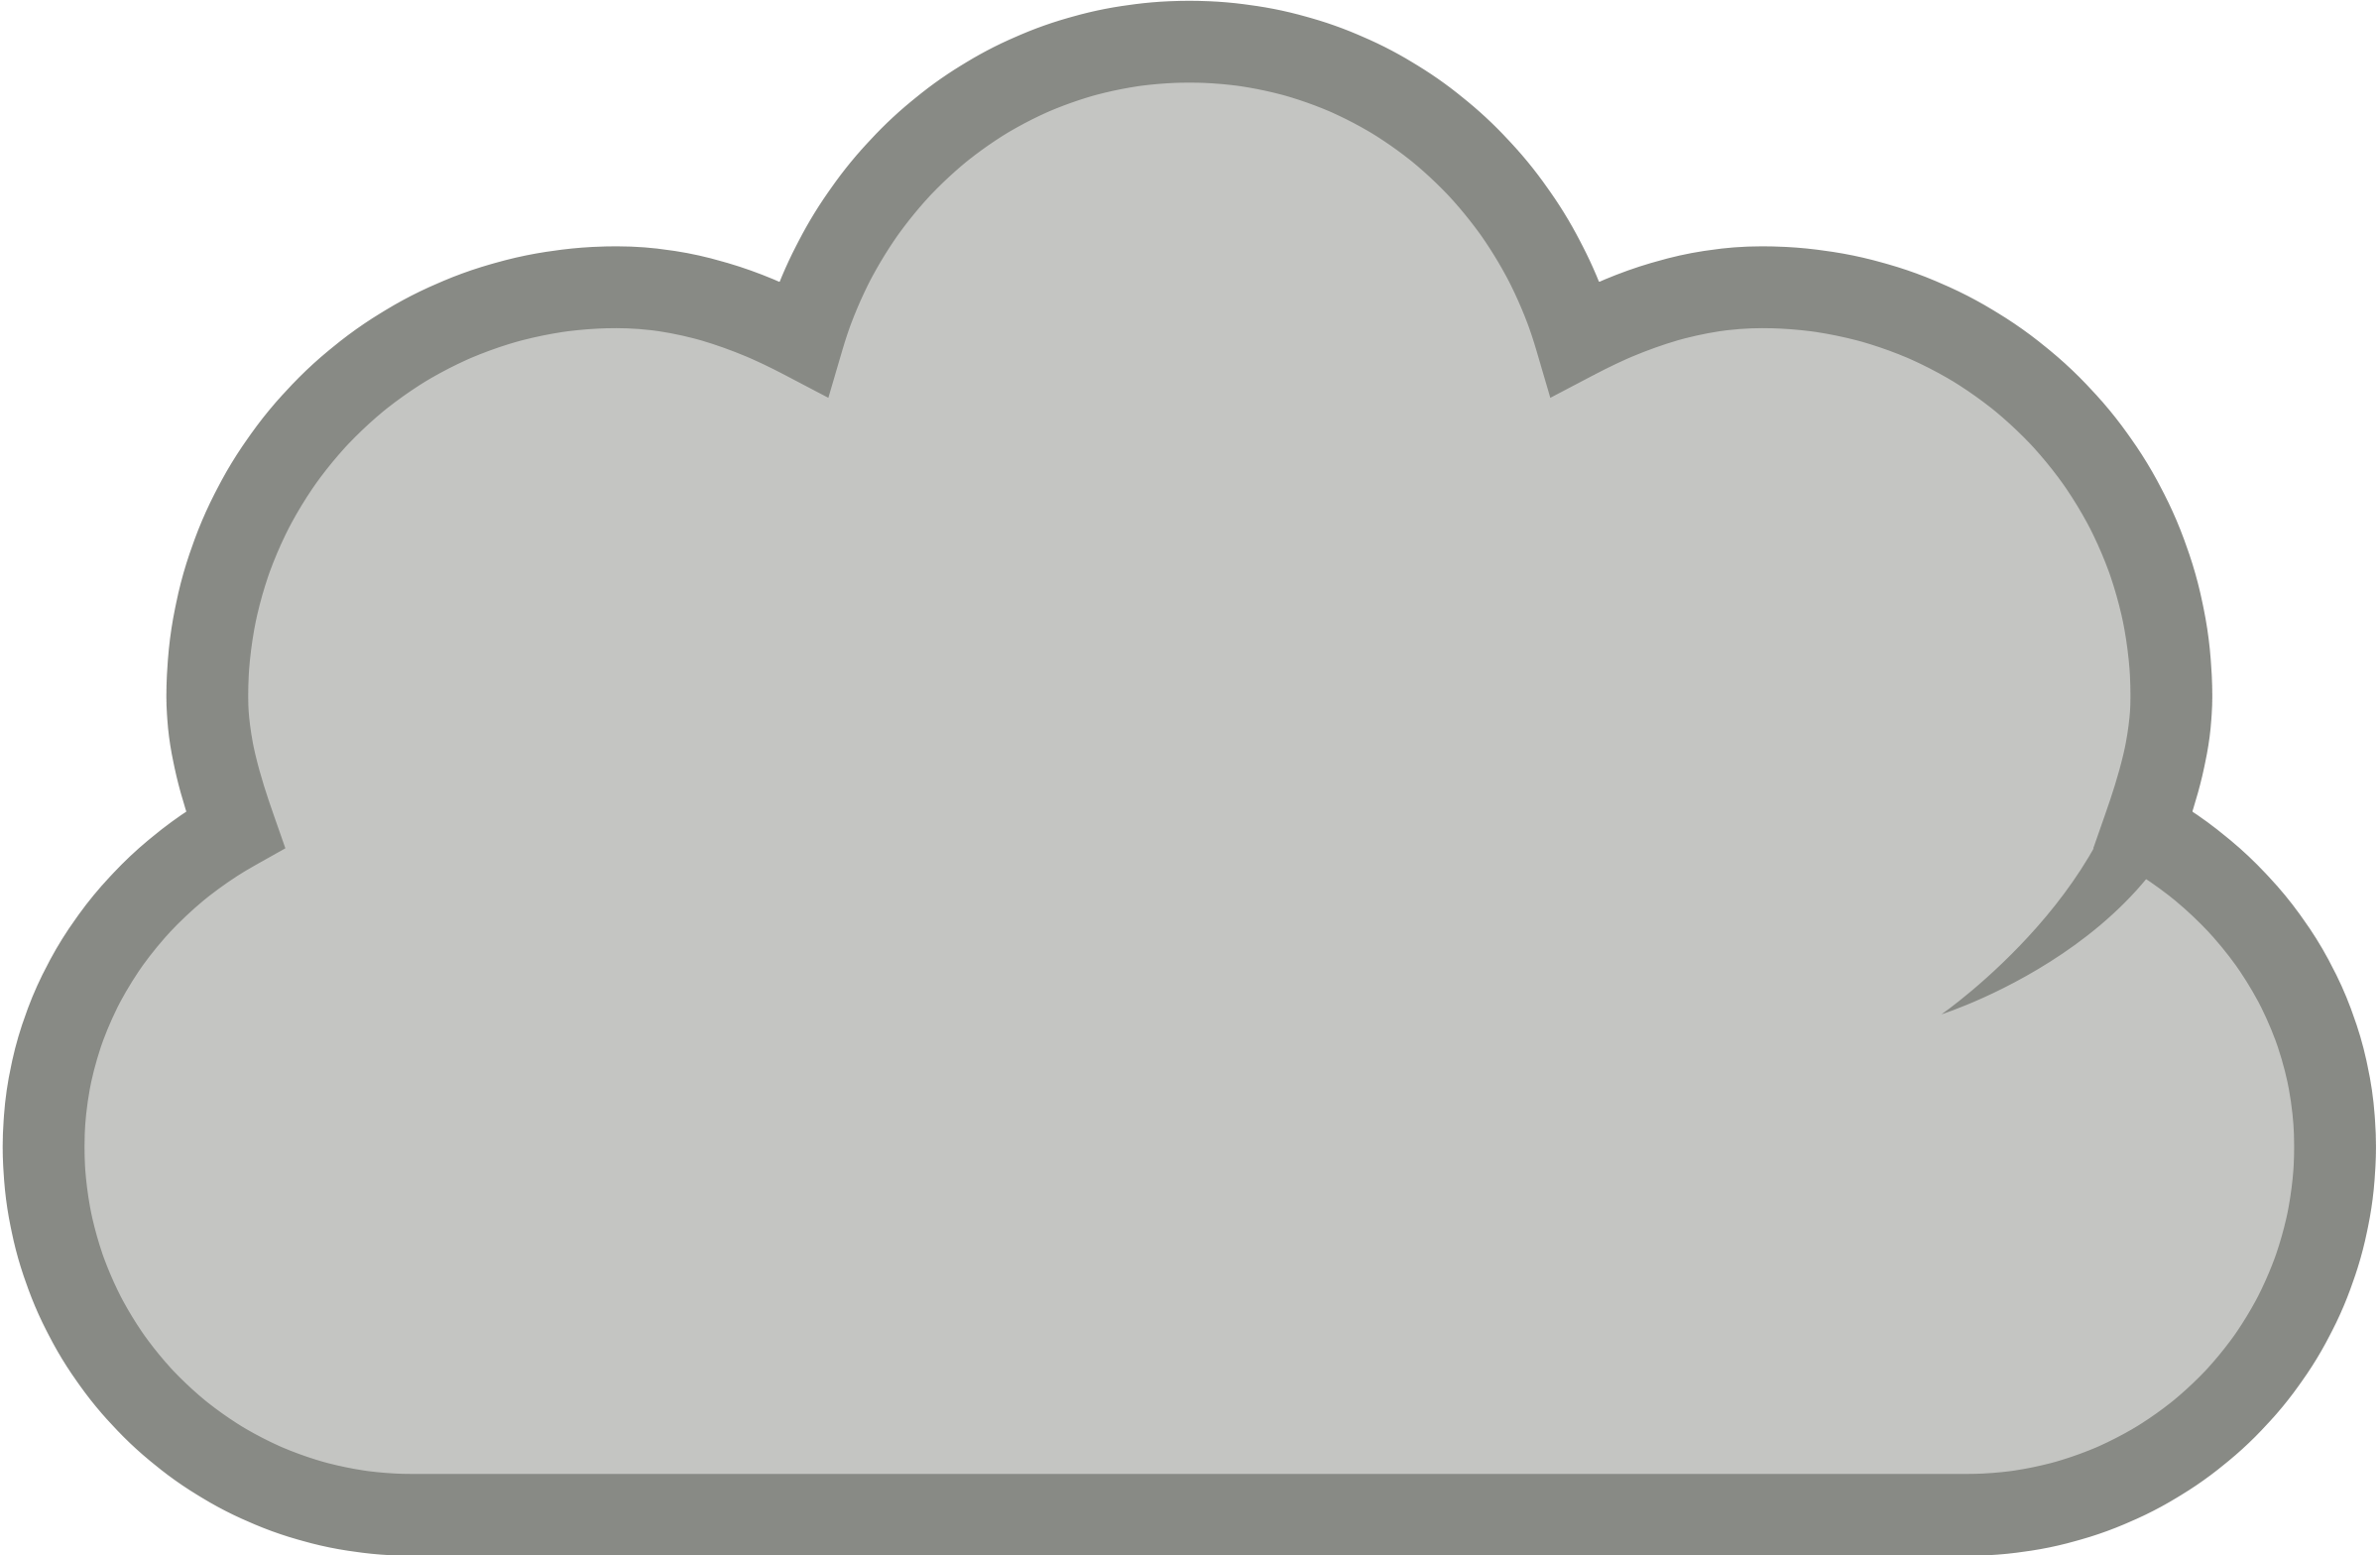 Cloud Clipart Free Clip art of Cloud Clipart #842 — Clipartwork.